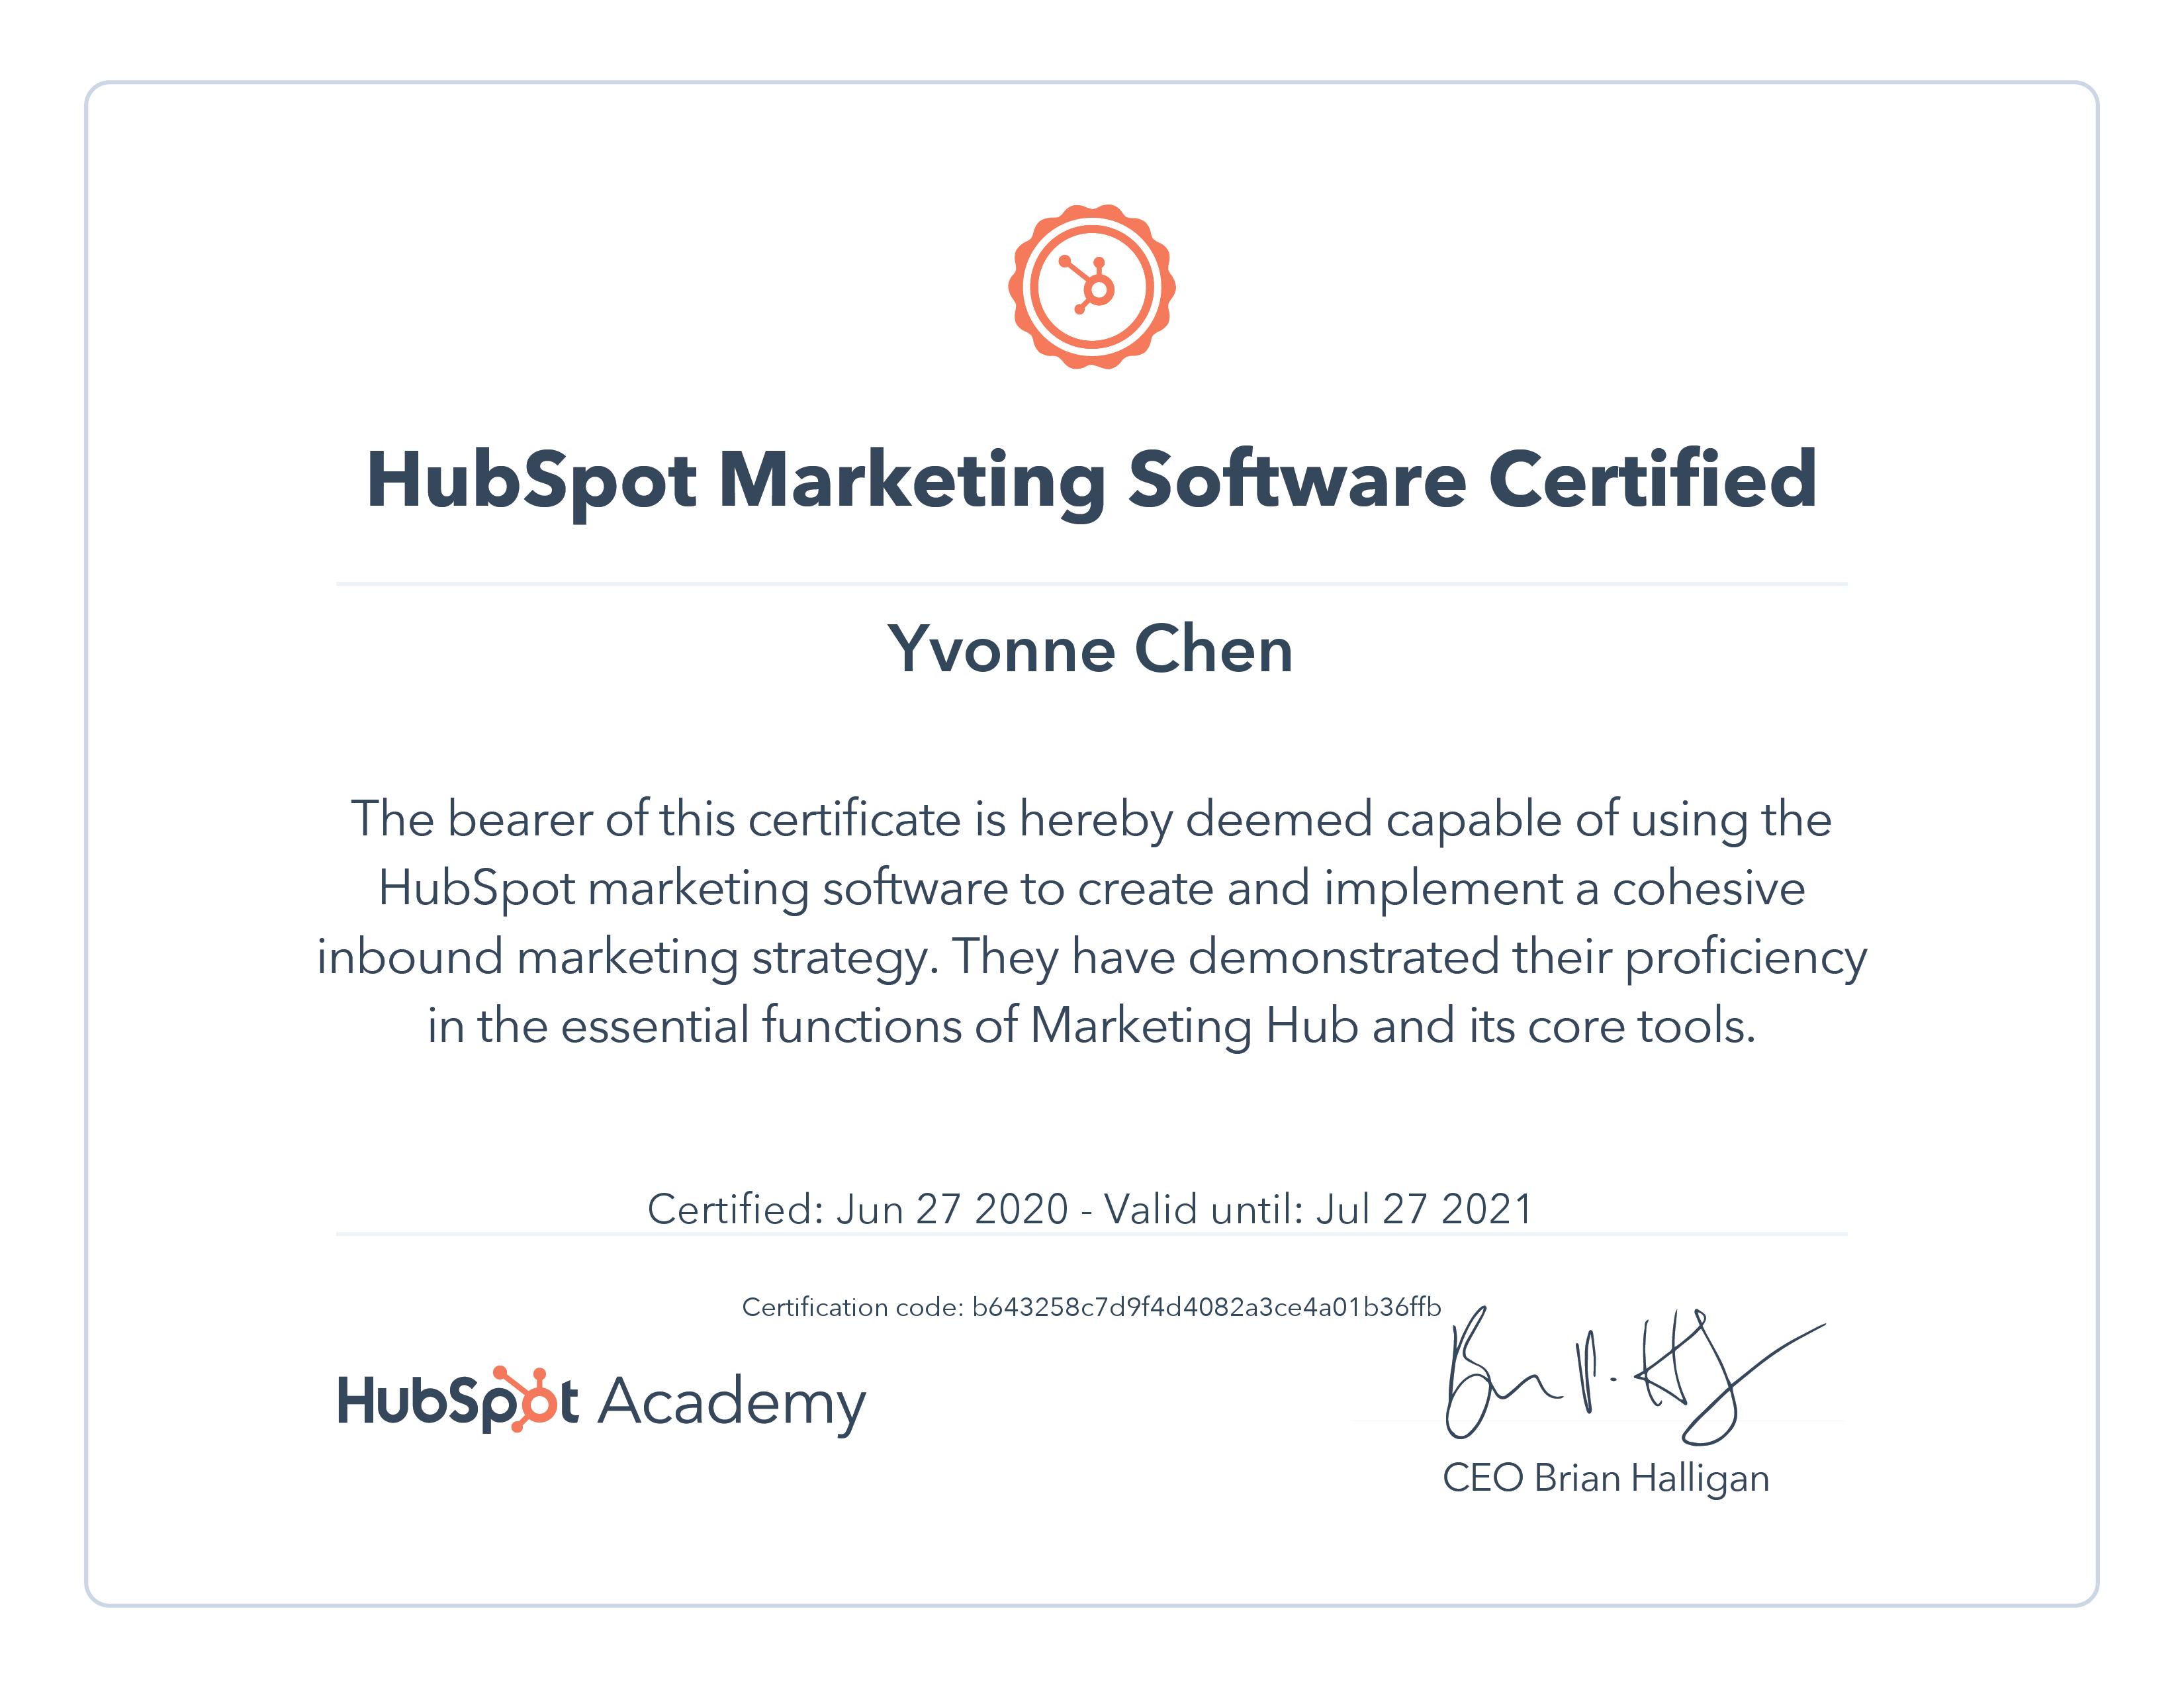 hubspot-marketing-software-certified_yvonne